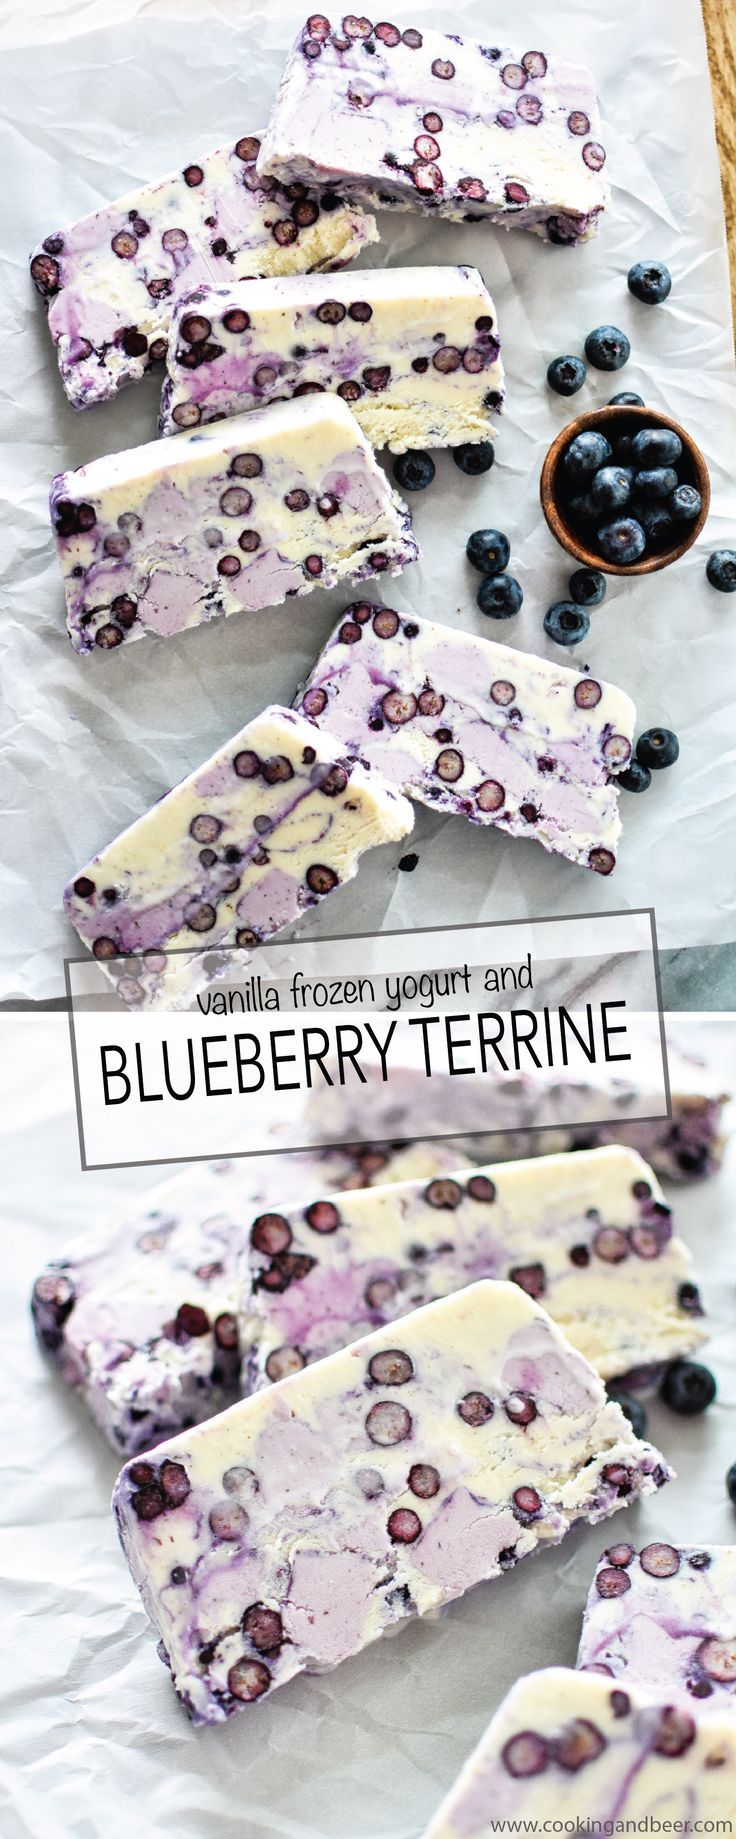 Vanilla Frozen Yogurt and Blueberry Terrine is the dessert recipe you NEED to serve this summer!   www.cookingandbeer.com